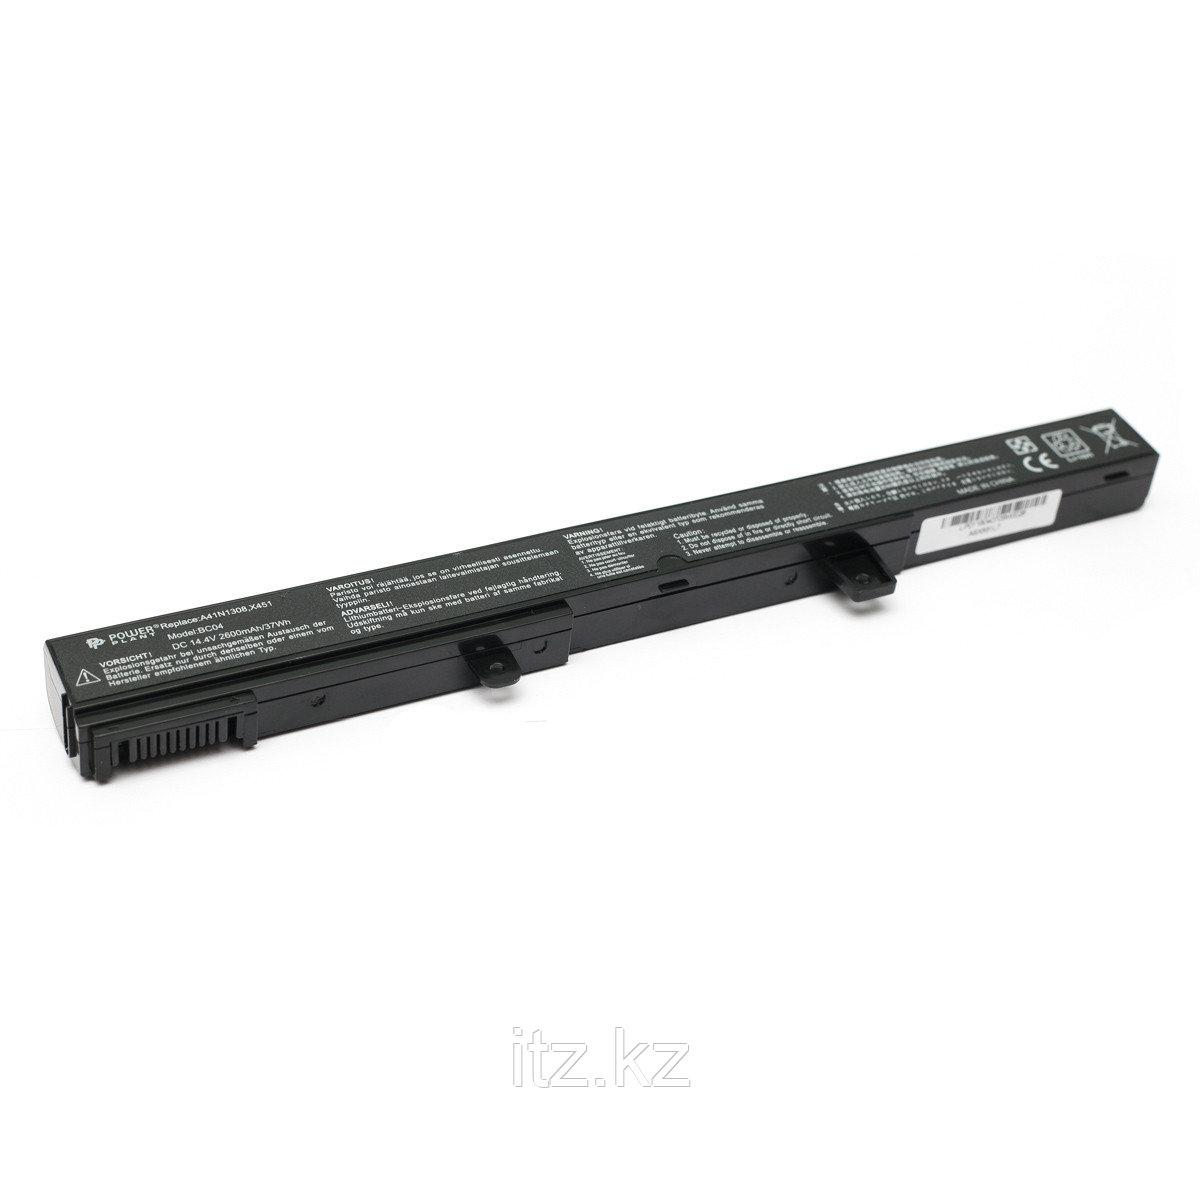 Аккумулятор PowerPlant для ноутбуков ASUS X451(A41N1308, ASX551L7) 14.4V 2600mAh